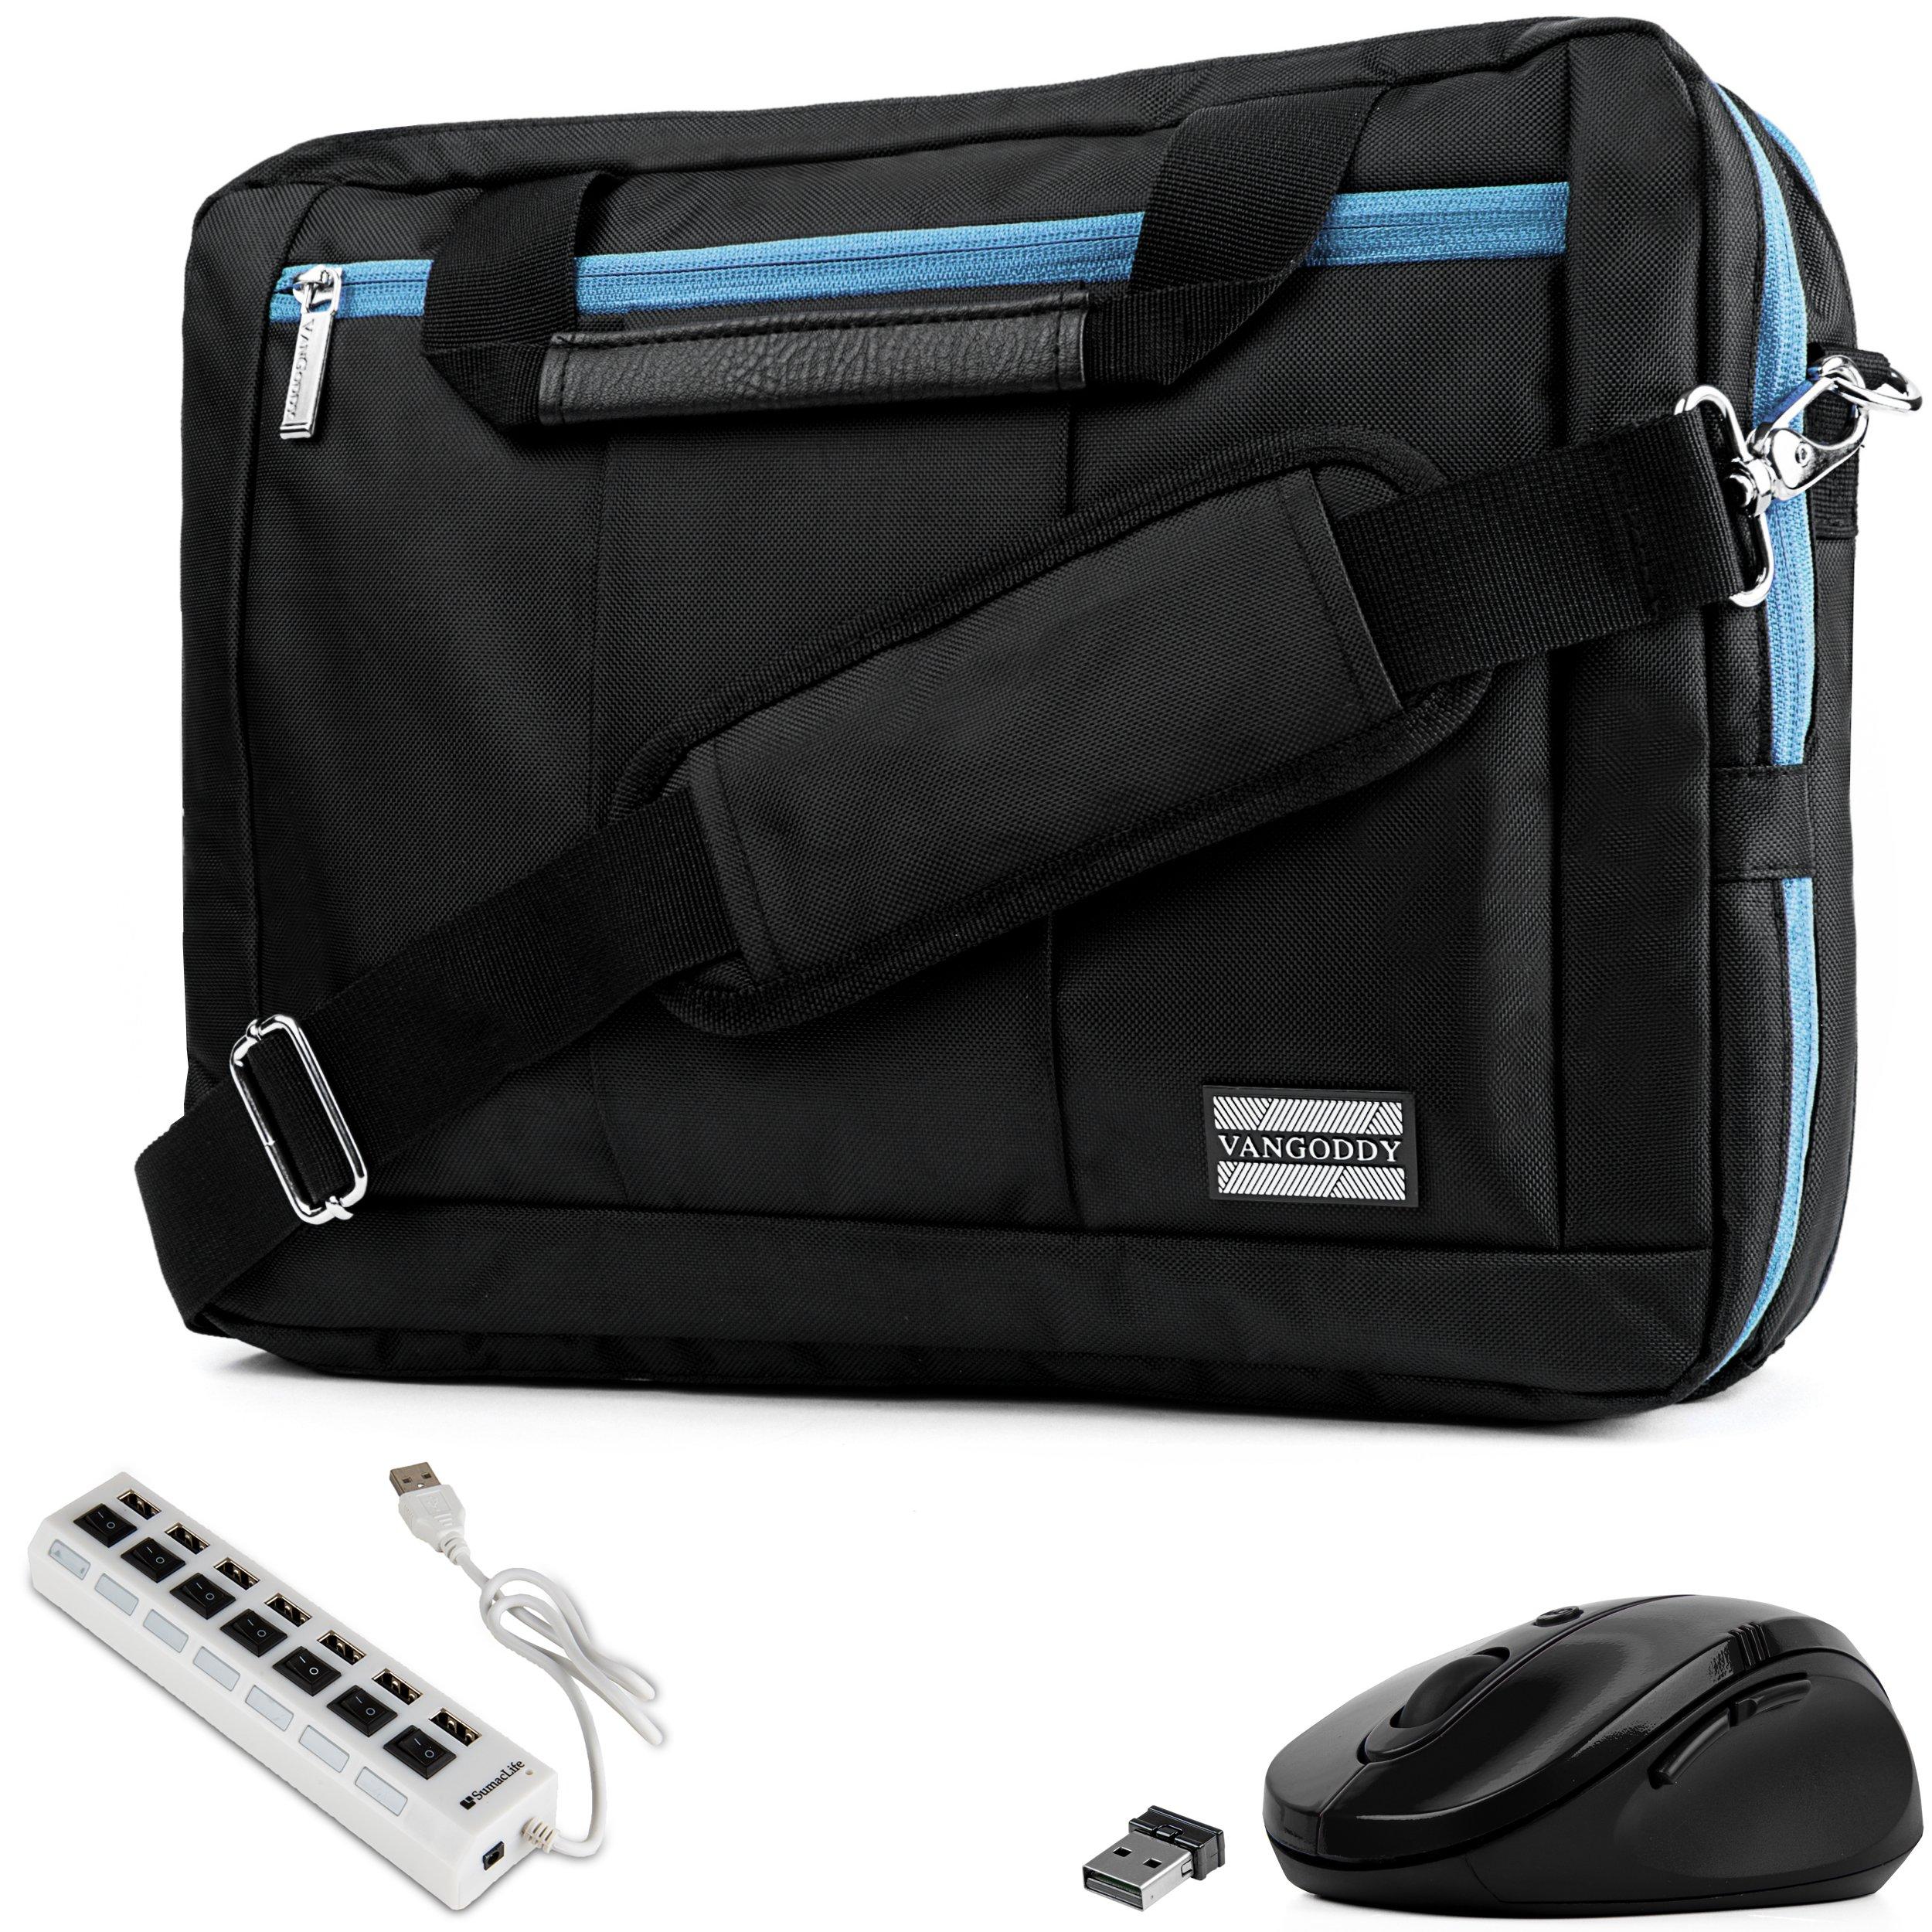 EL Prado 3-in-1 Hybrid Aqua Trim Laptop Bag